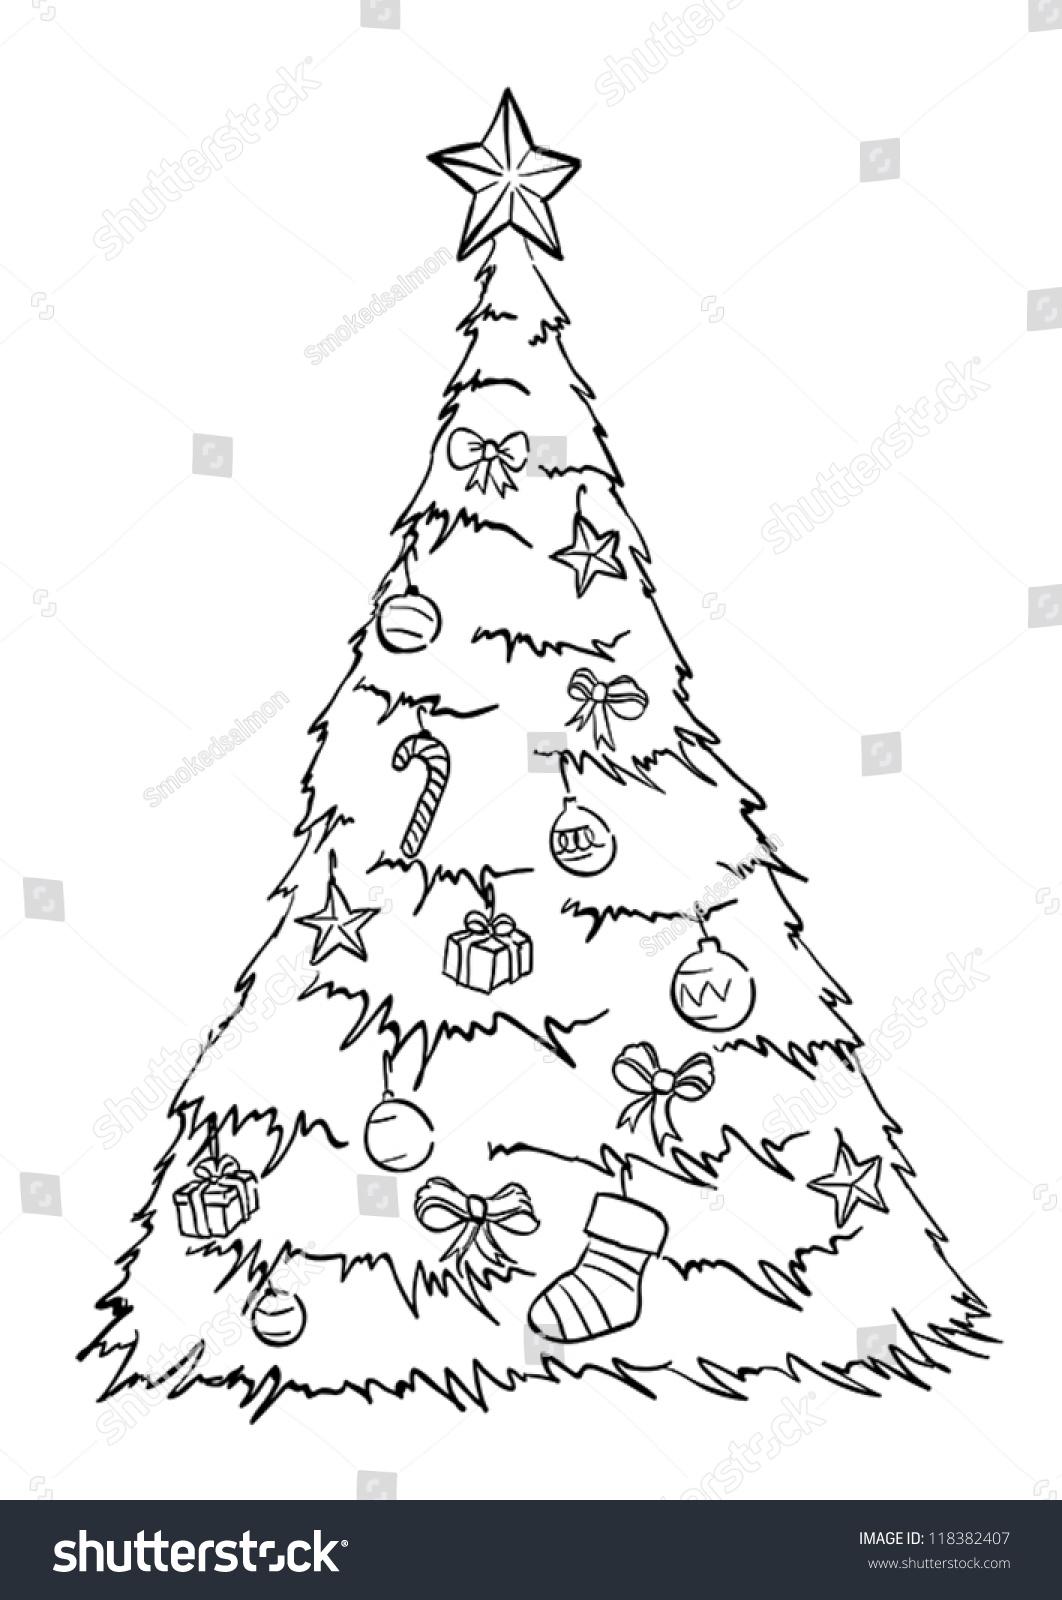 Christmas tree drawing outline - Christmas Tree Outline Vector